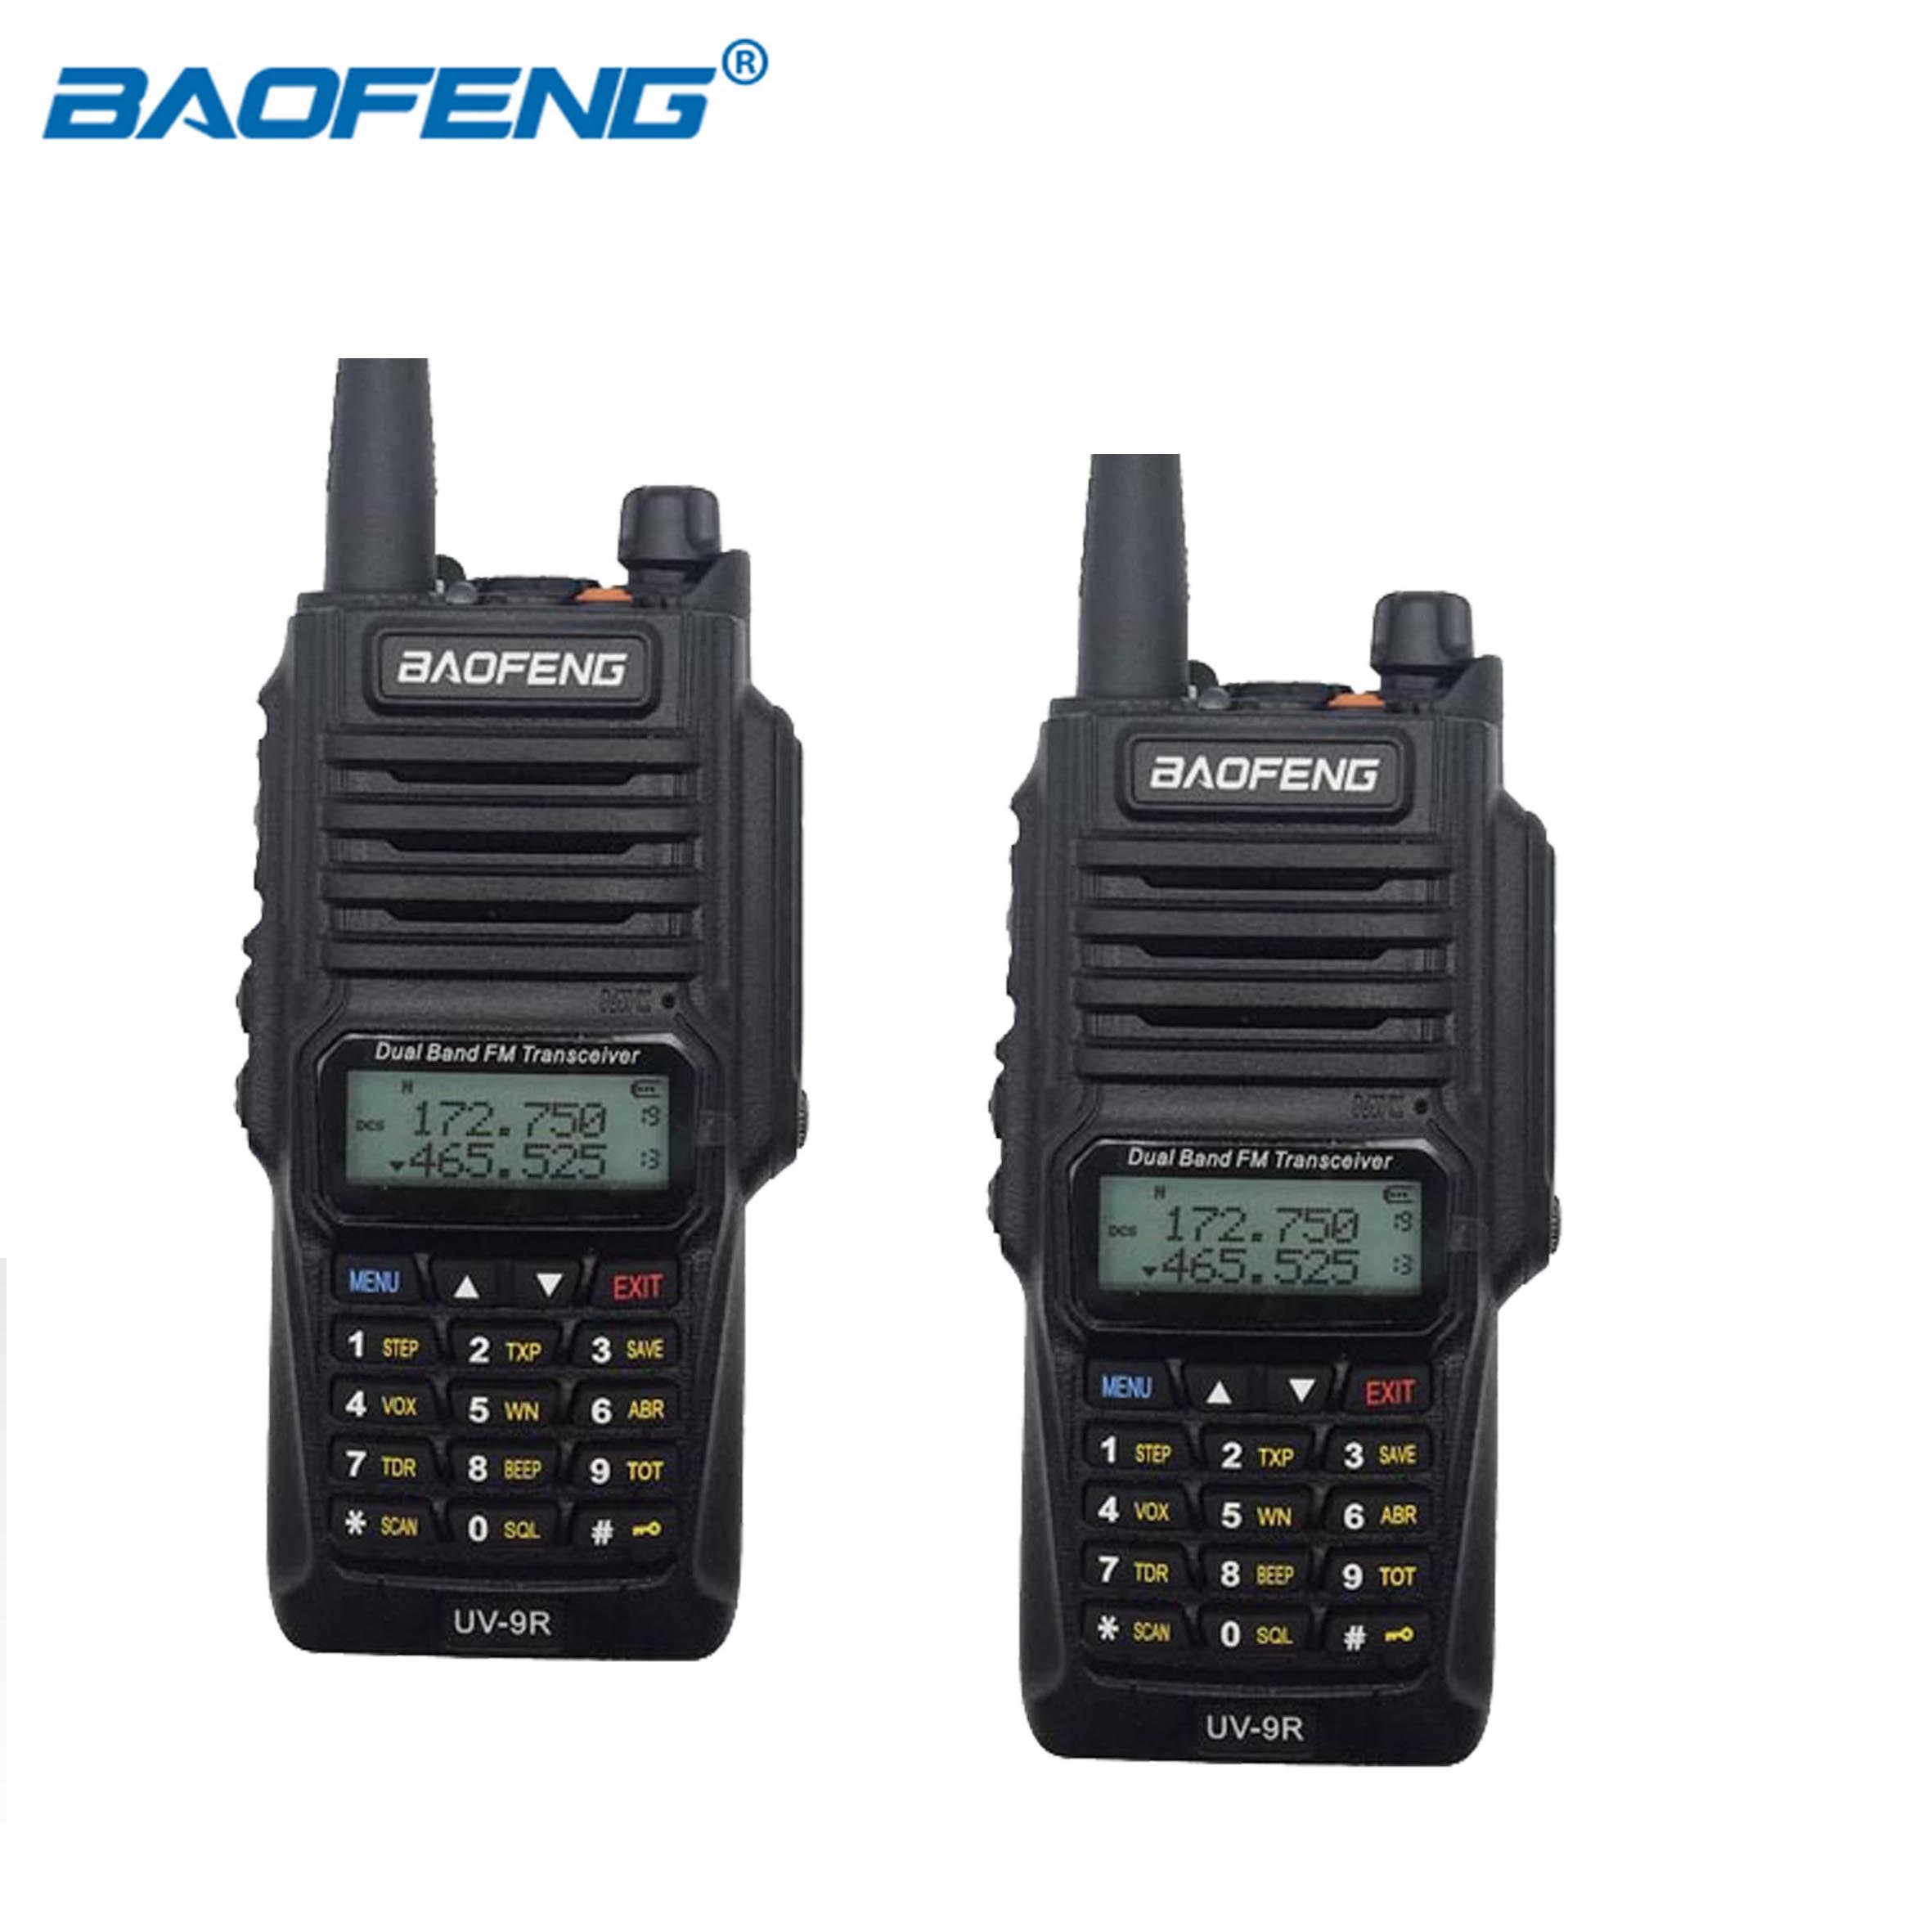 Baofeng UV 9R IP67 Waterproof Two Way Radio Dual Band UHF VHF Walkie Talkie 8W 128CH